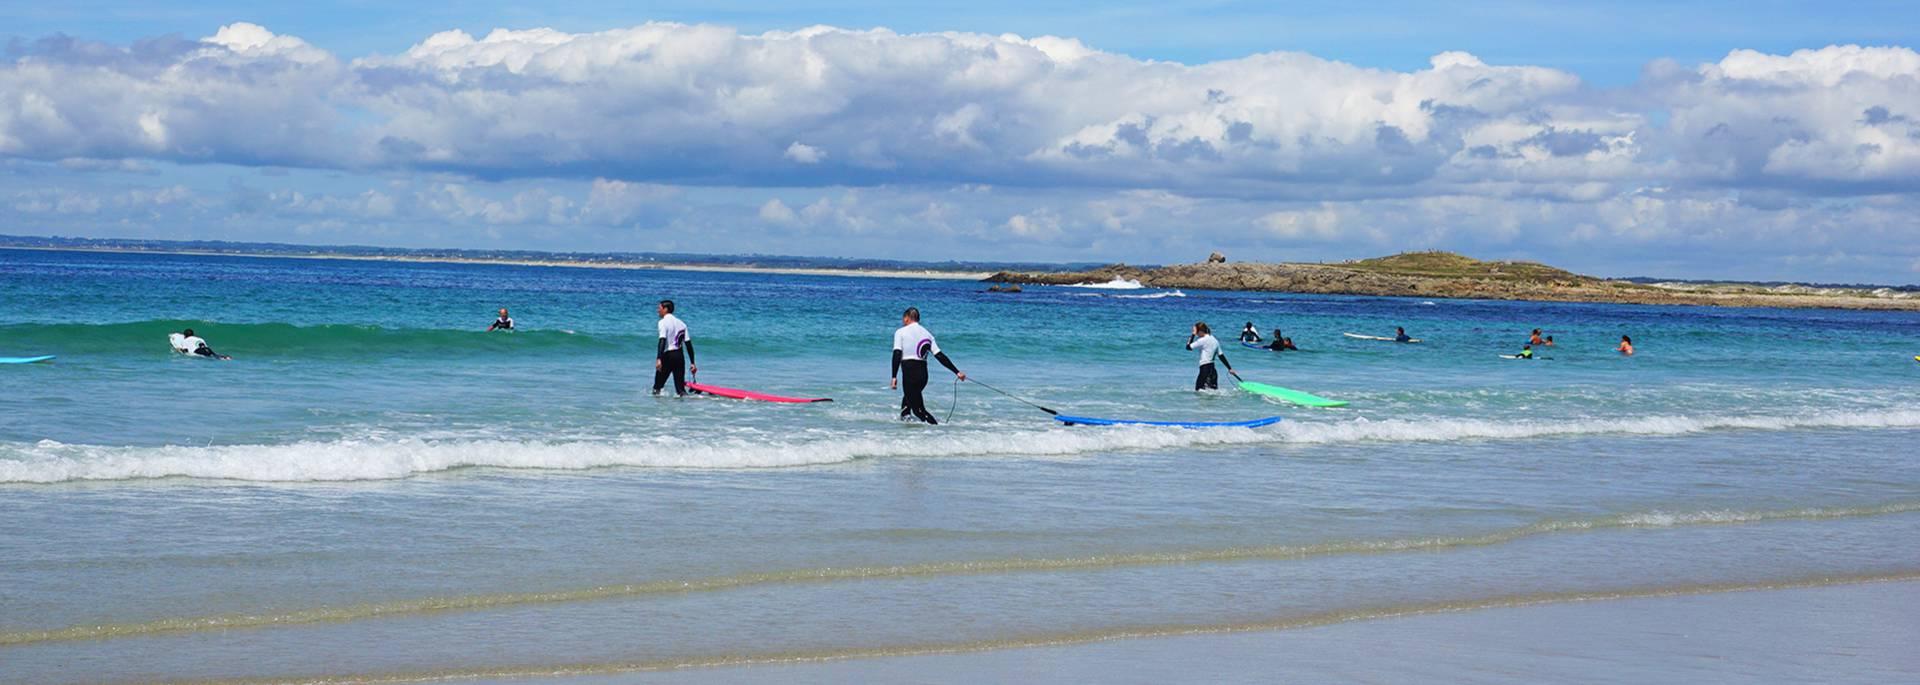 Surfing at Pors Carn near La Torche, Pays Bigouden © E Cleret